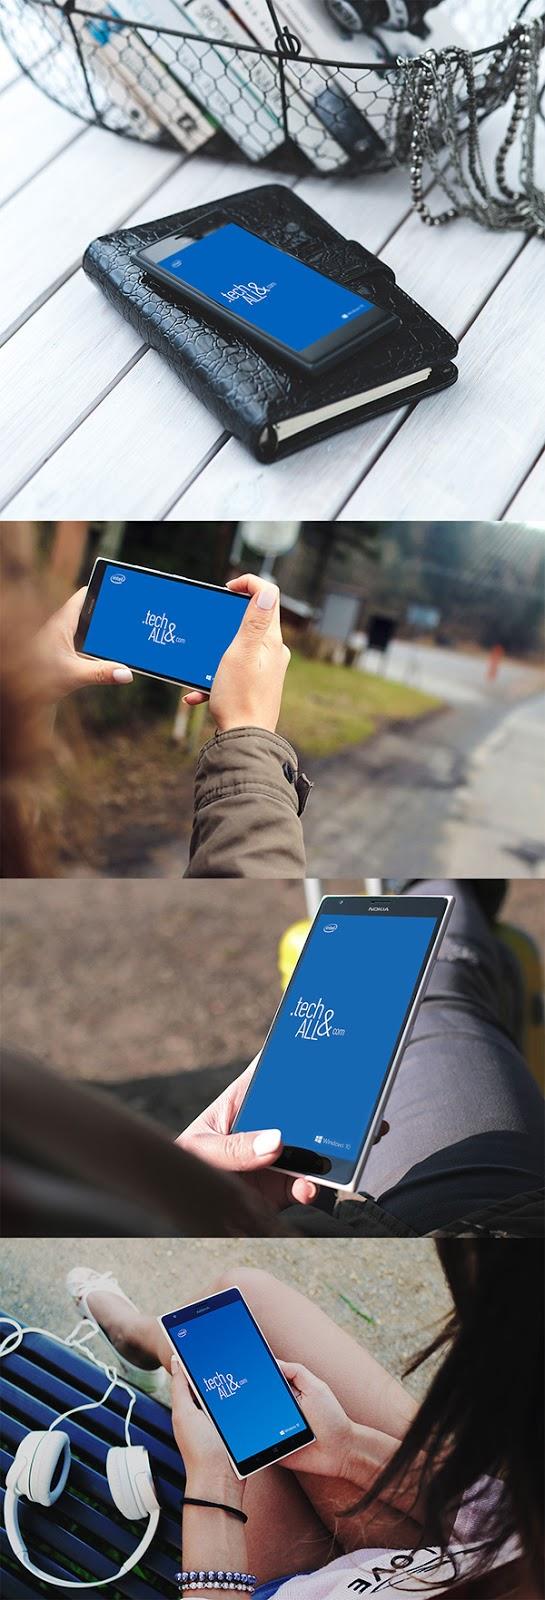 Smartphone & Tablet Mockup PSD Terbaru Gratis - Nokia Lumia PSD Mockup